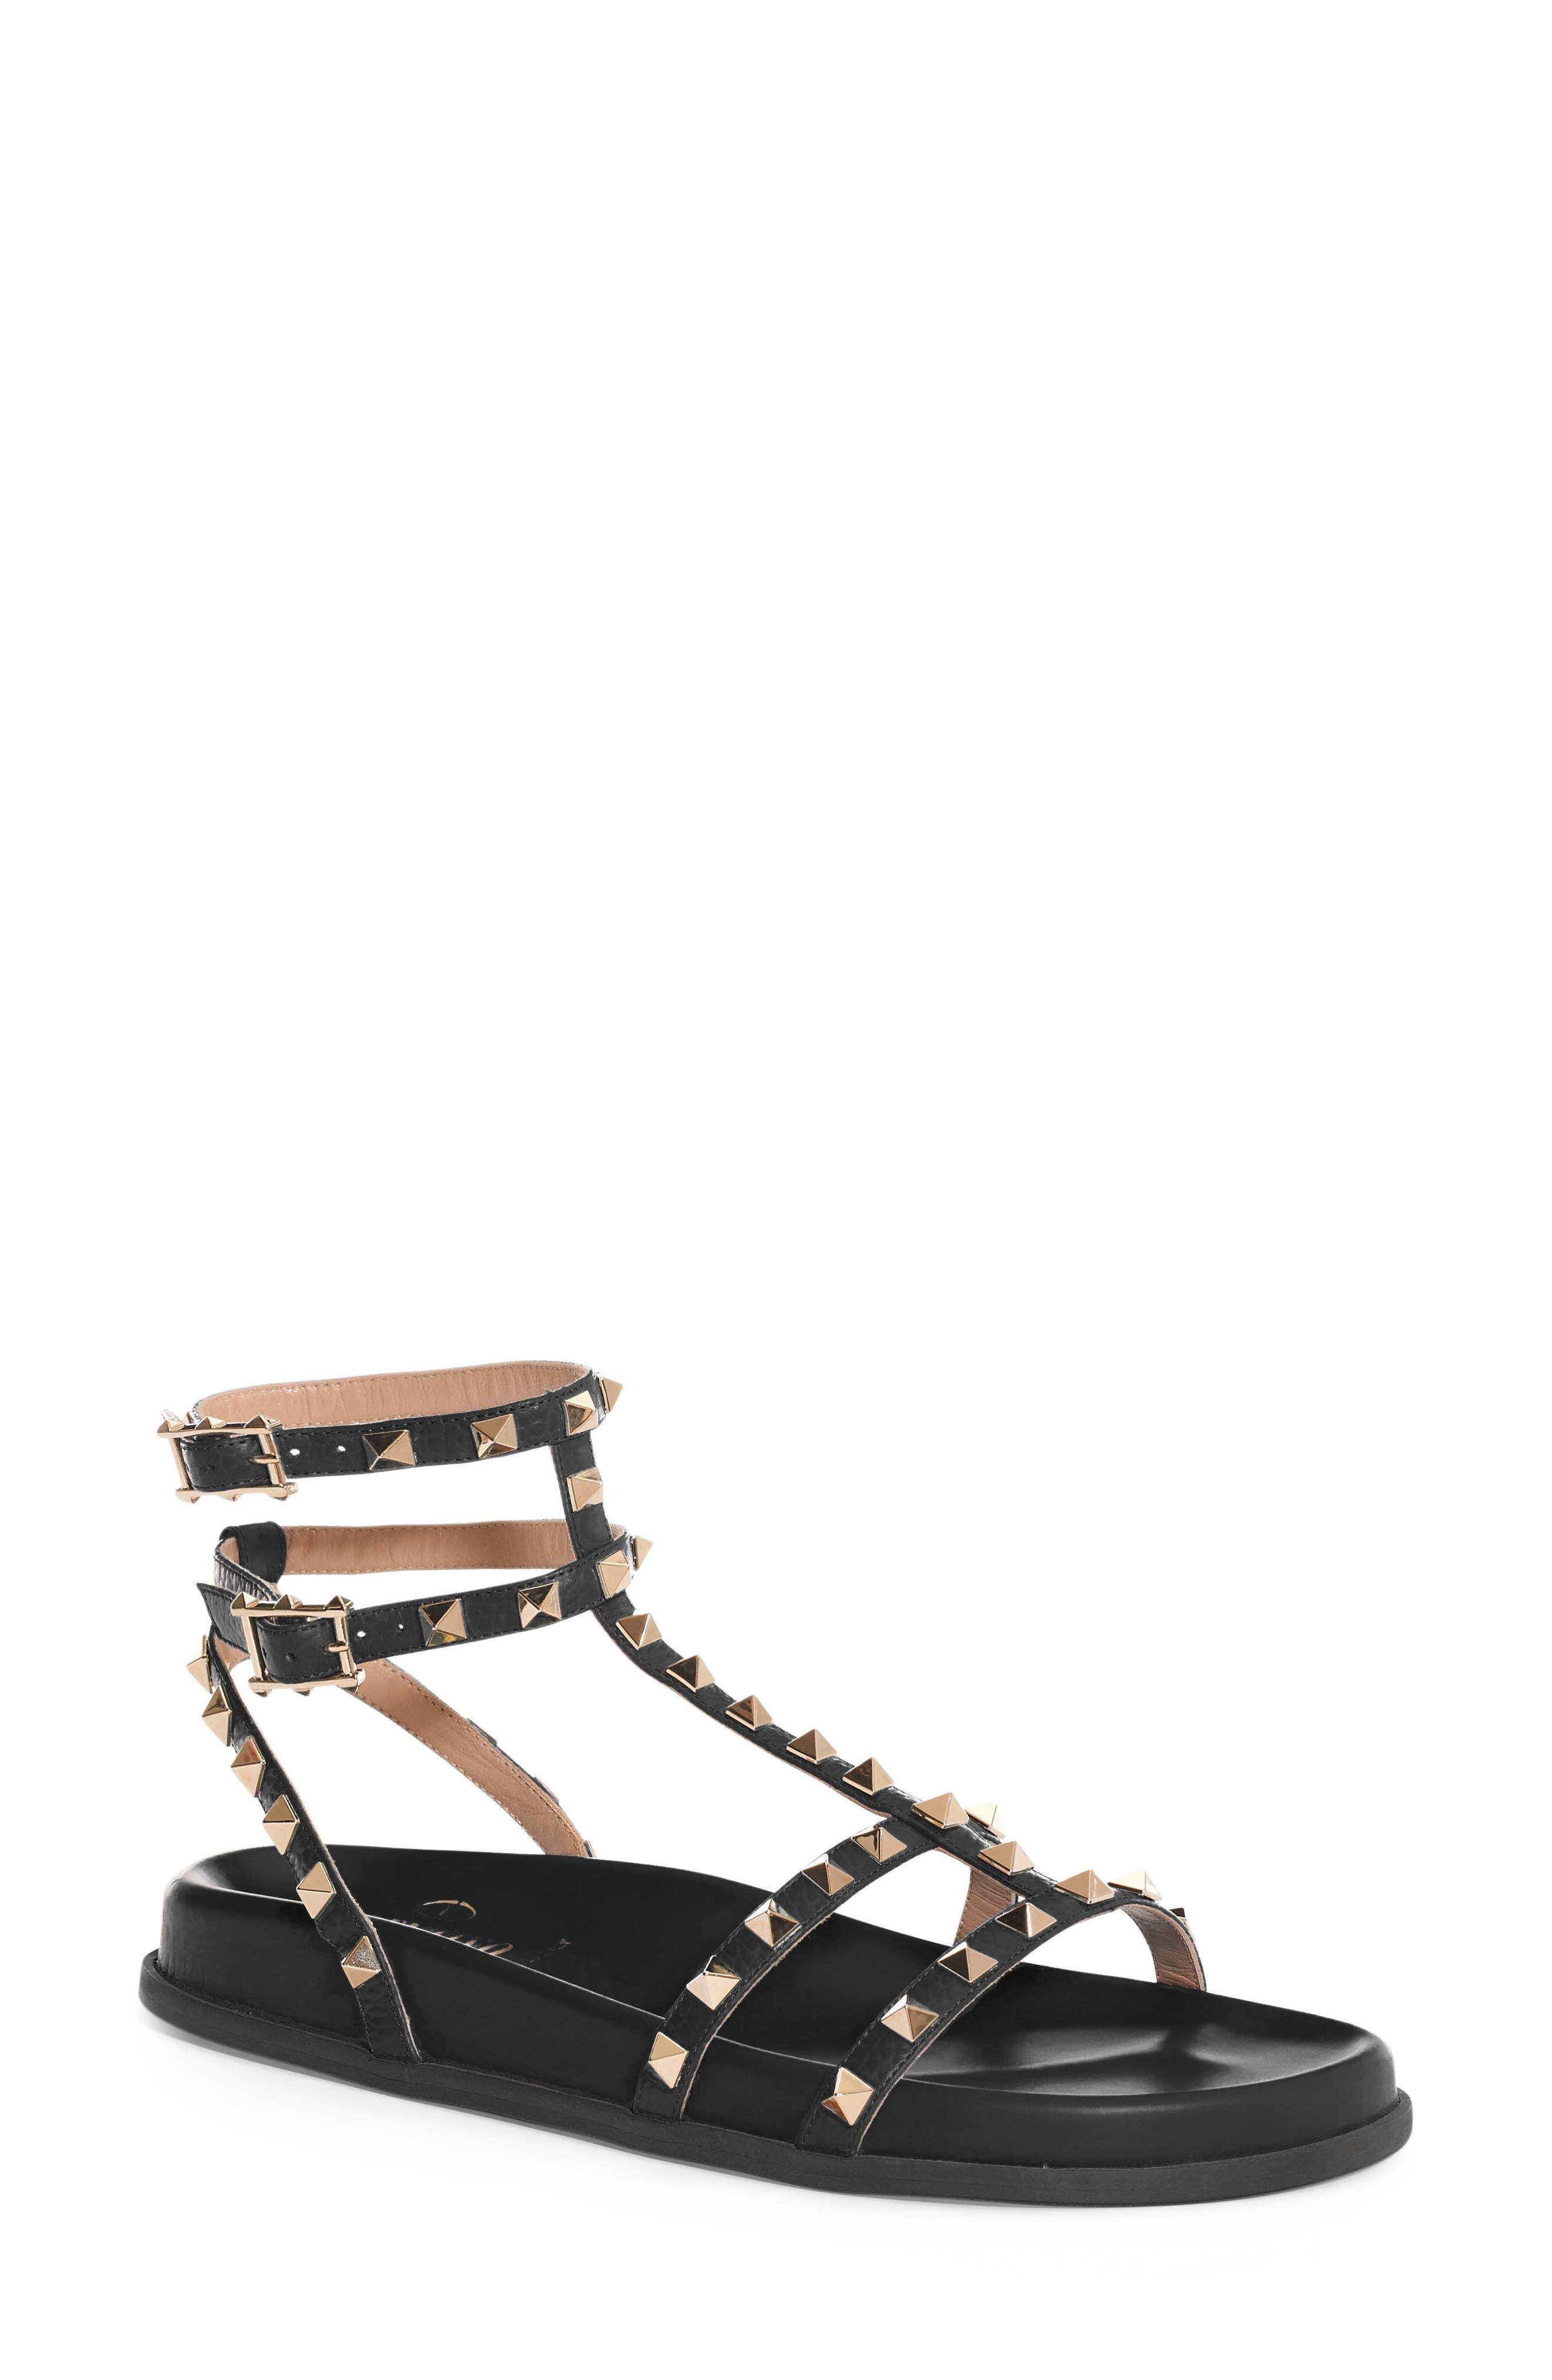 Alternate Image 1 Selected - VALENTINO GARAVANI Rockstud Flatform Sandal (Women)